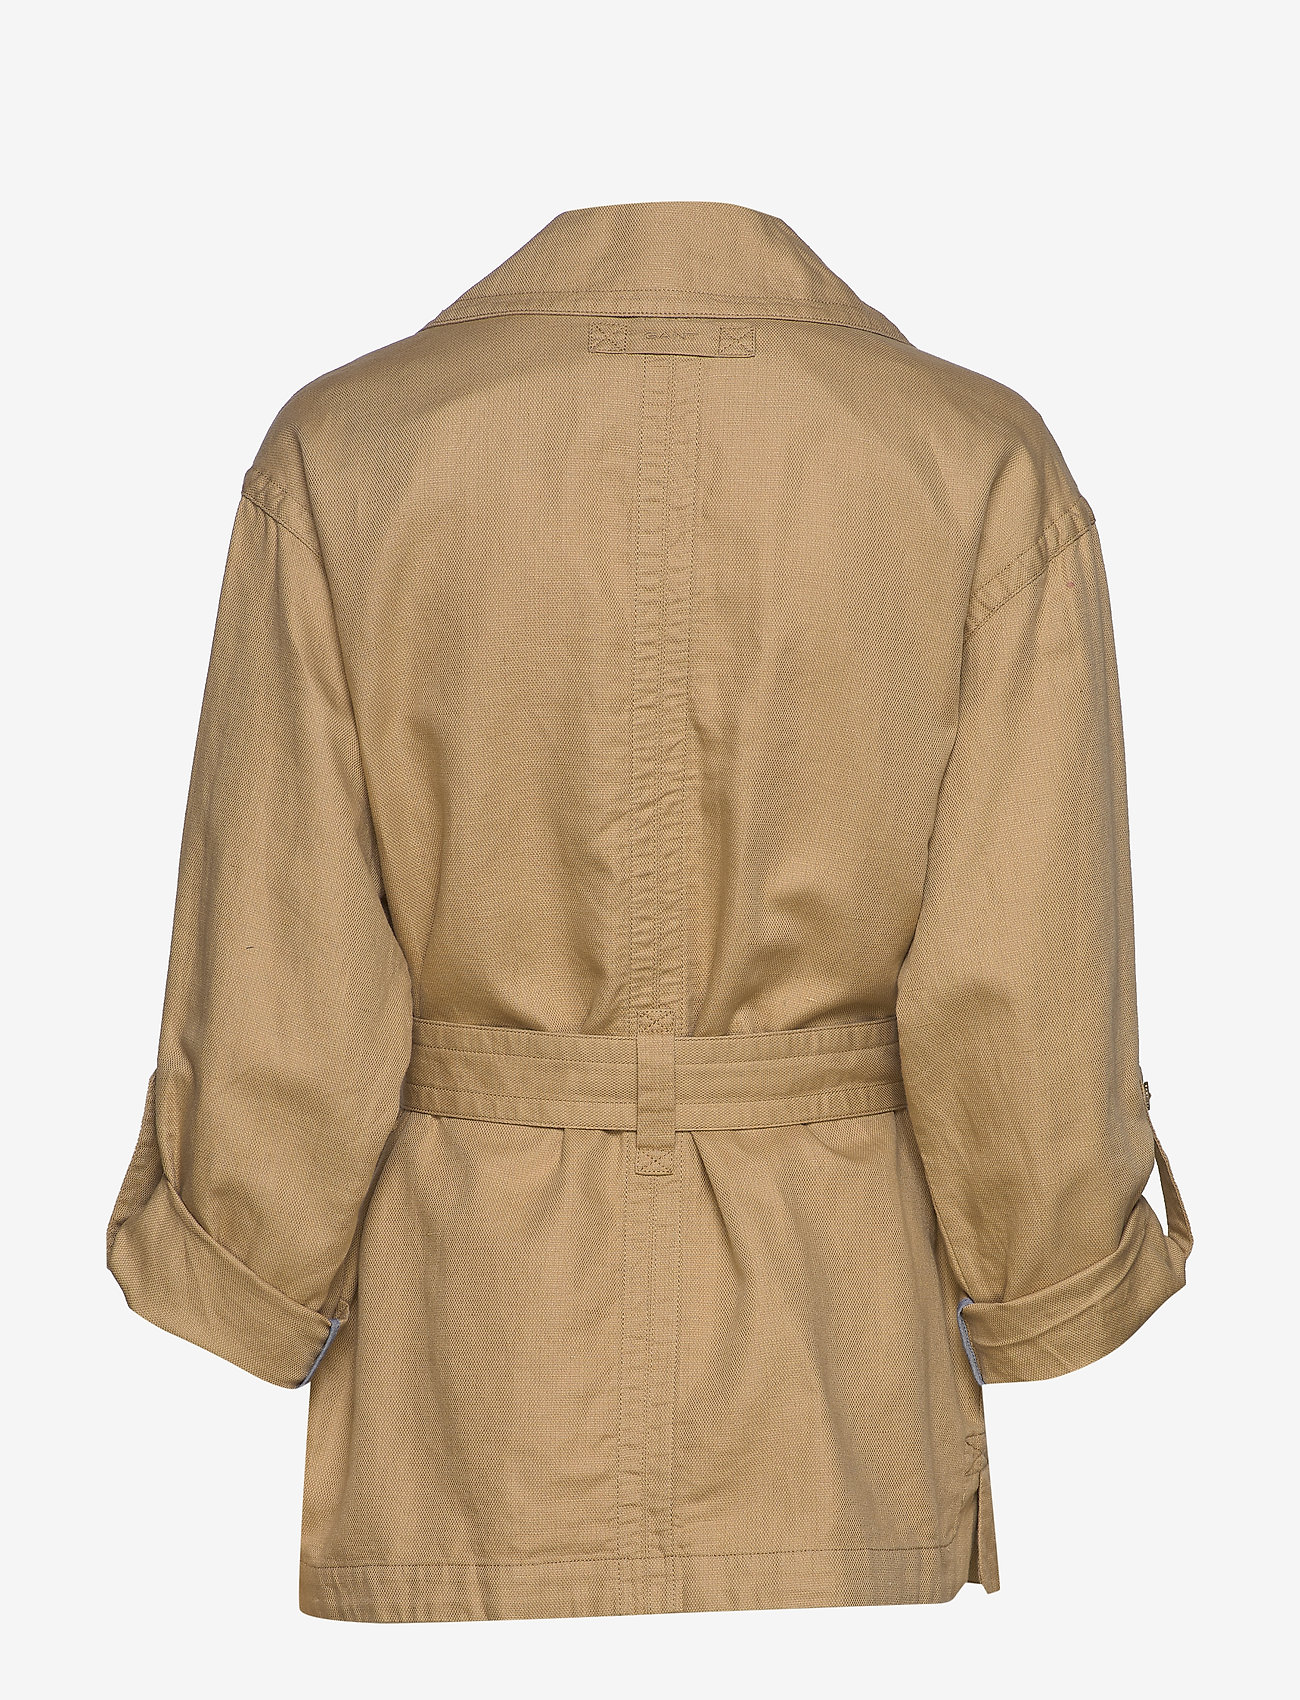 Gant - D2. BELTED FIELD JACKET - vestes legères - dark khaki